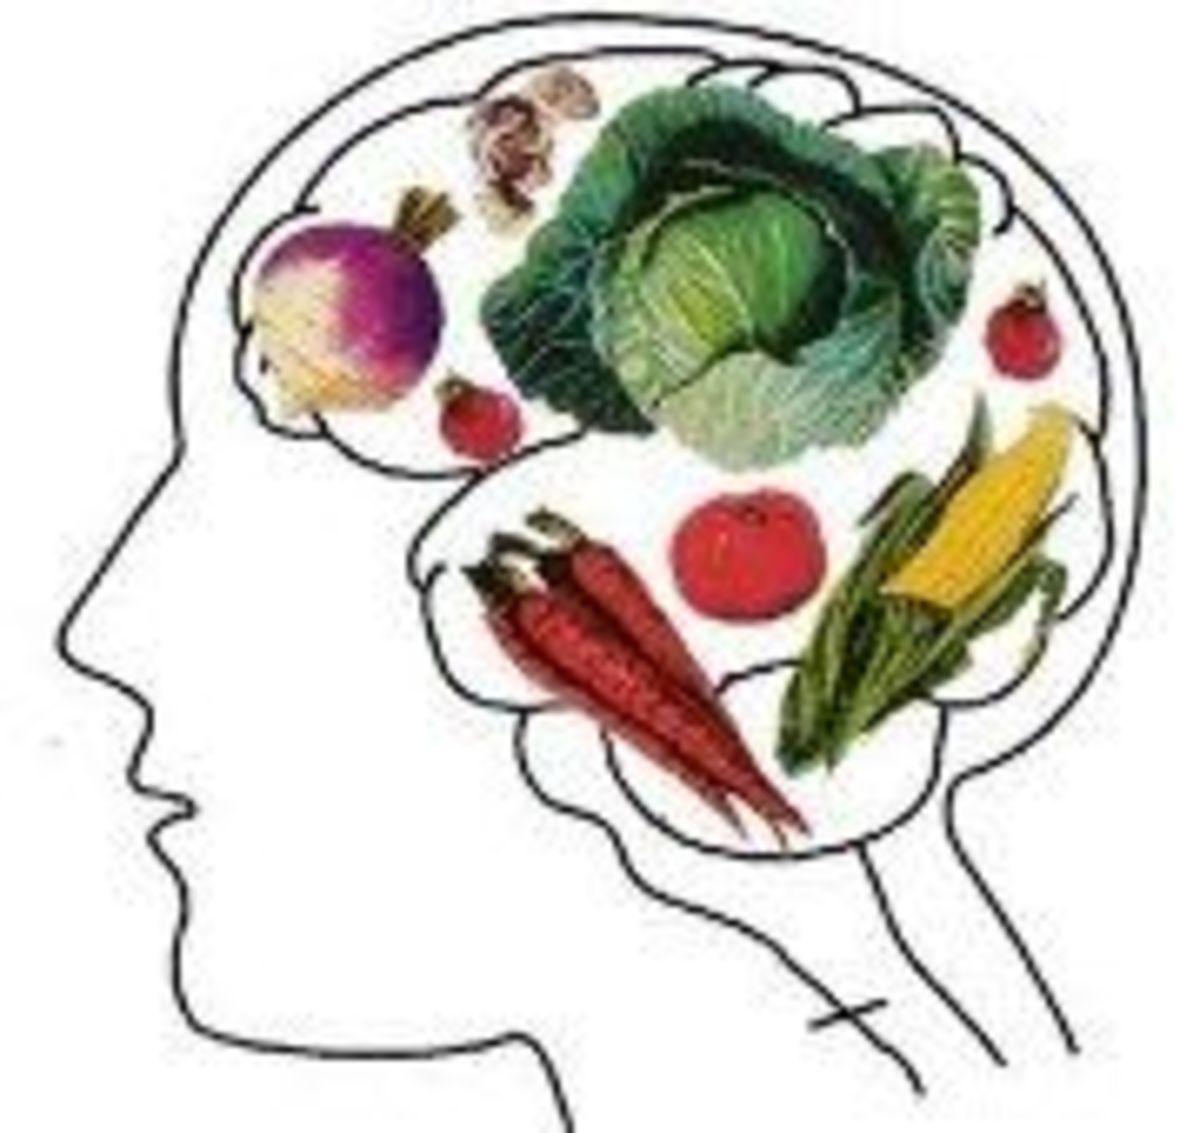 sikhs eat meat, meat, sikhs, squidoo, veg, vegan, vegetarian, veg vs meat